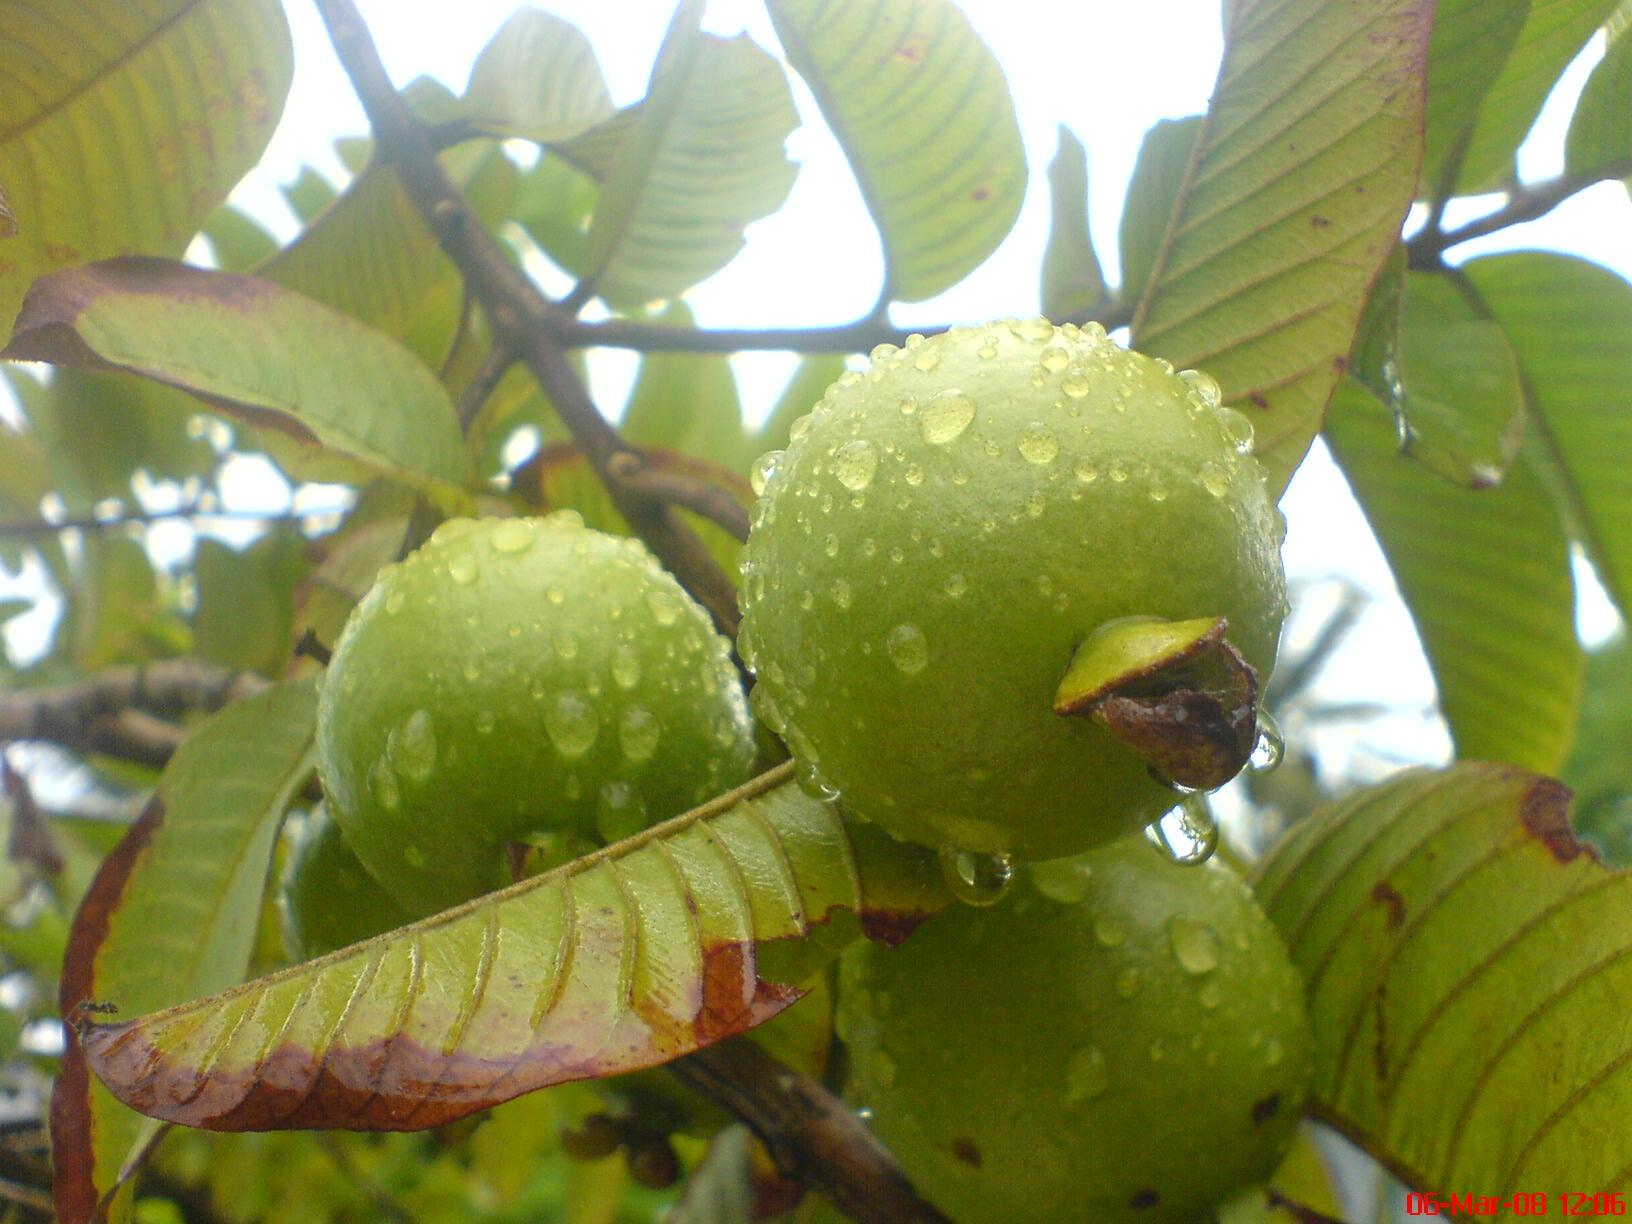 File:Apple Guava.jpg - Wikimedia Commons